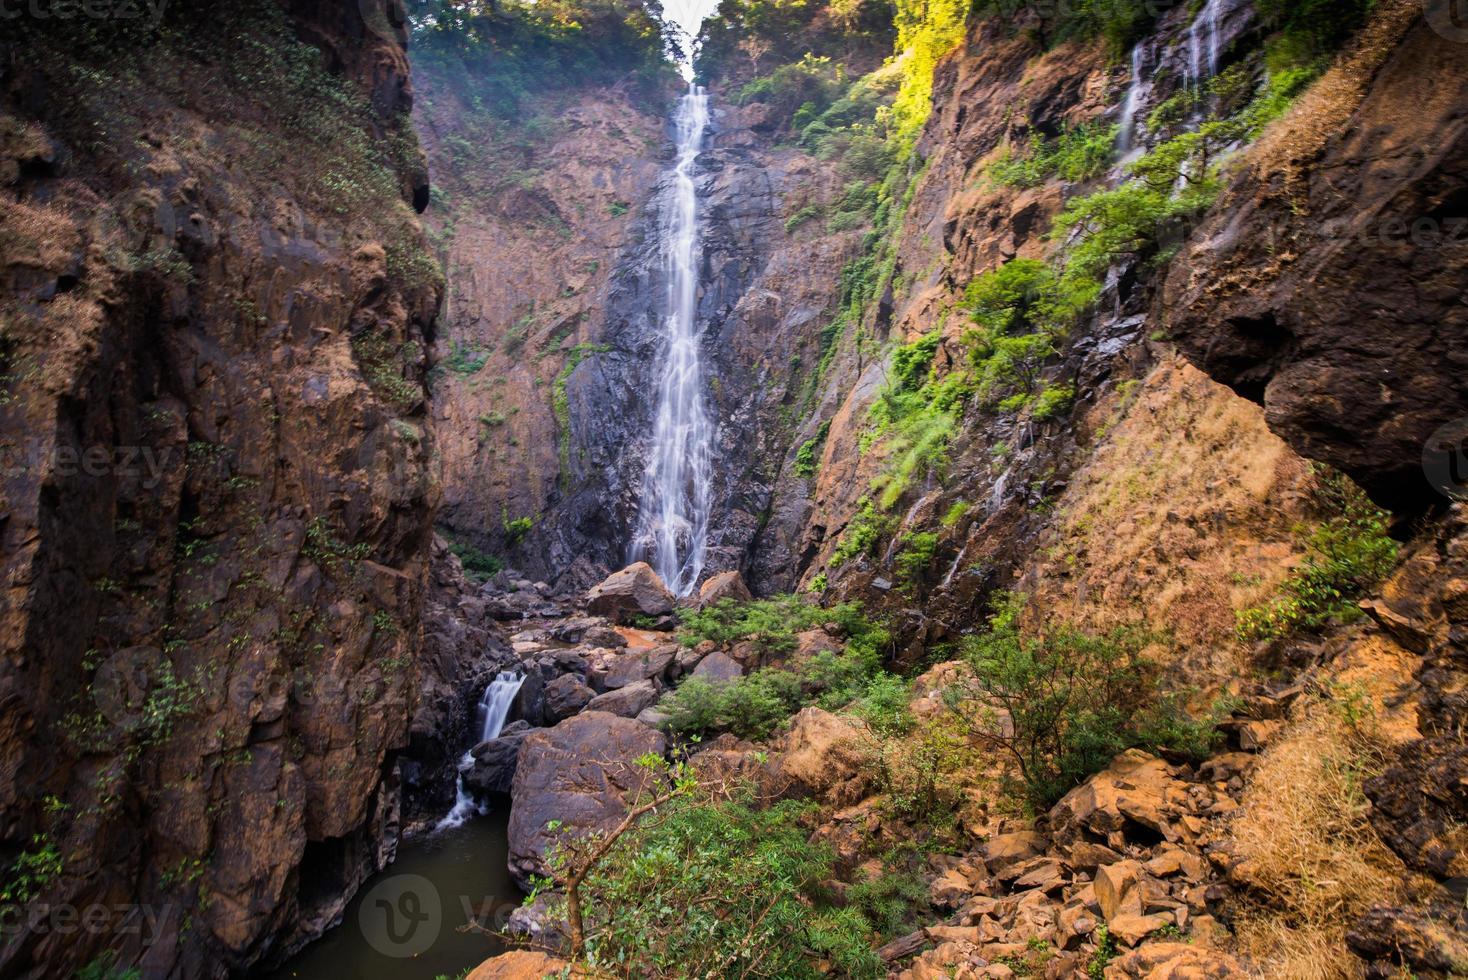 vue de face de la cascade de dabbe photo